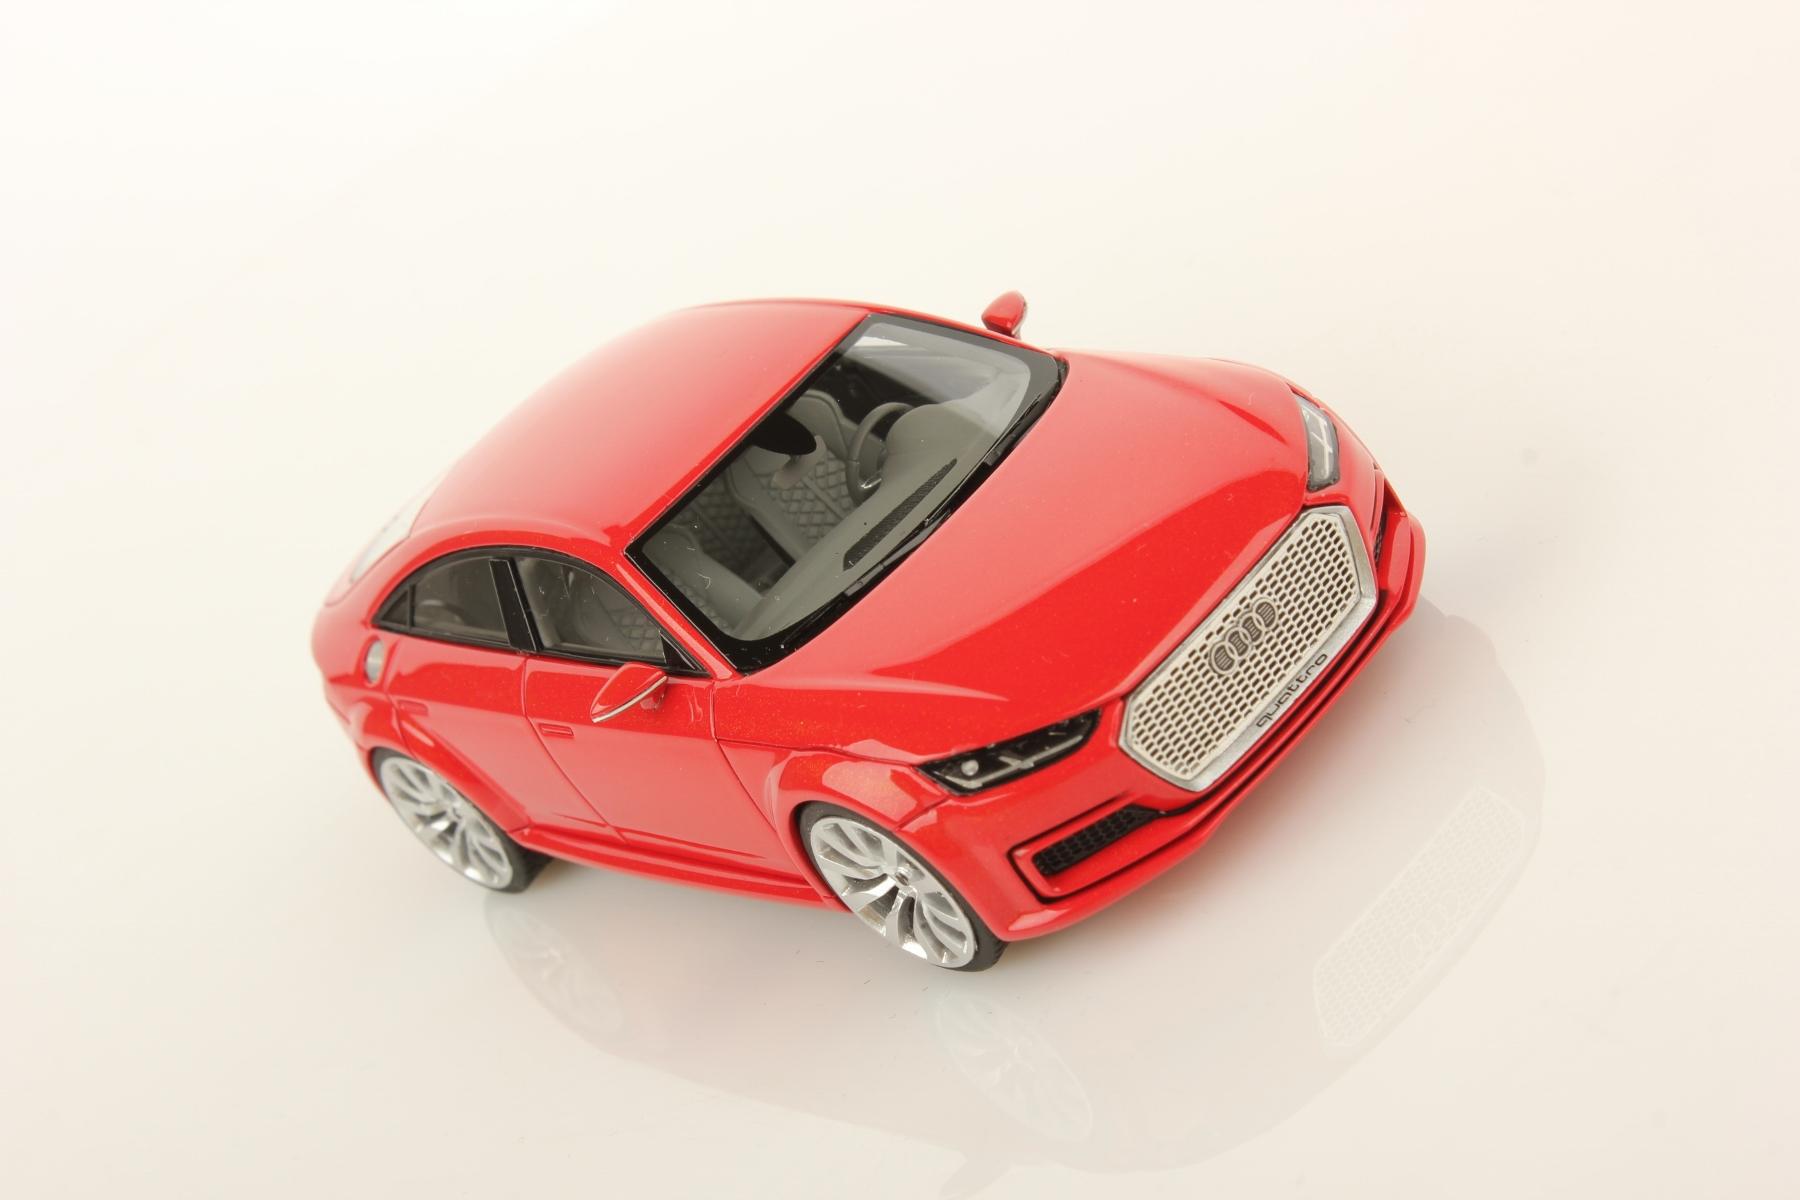 LSAUDITTSB Audi TT Sportback Concept Scale 1 43 b